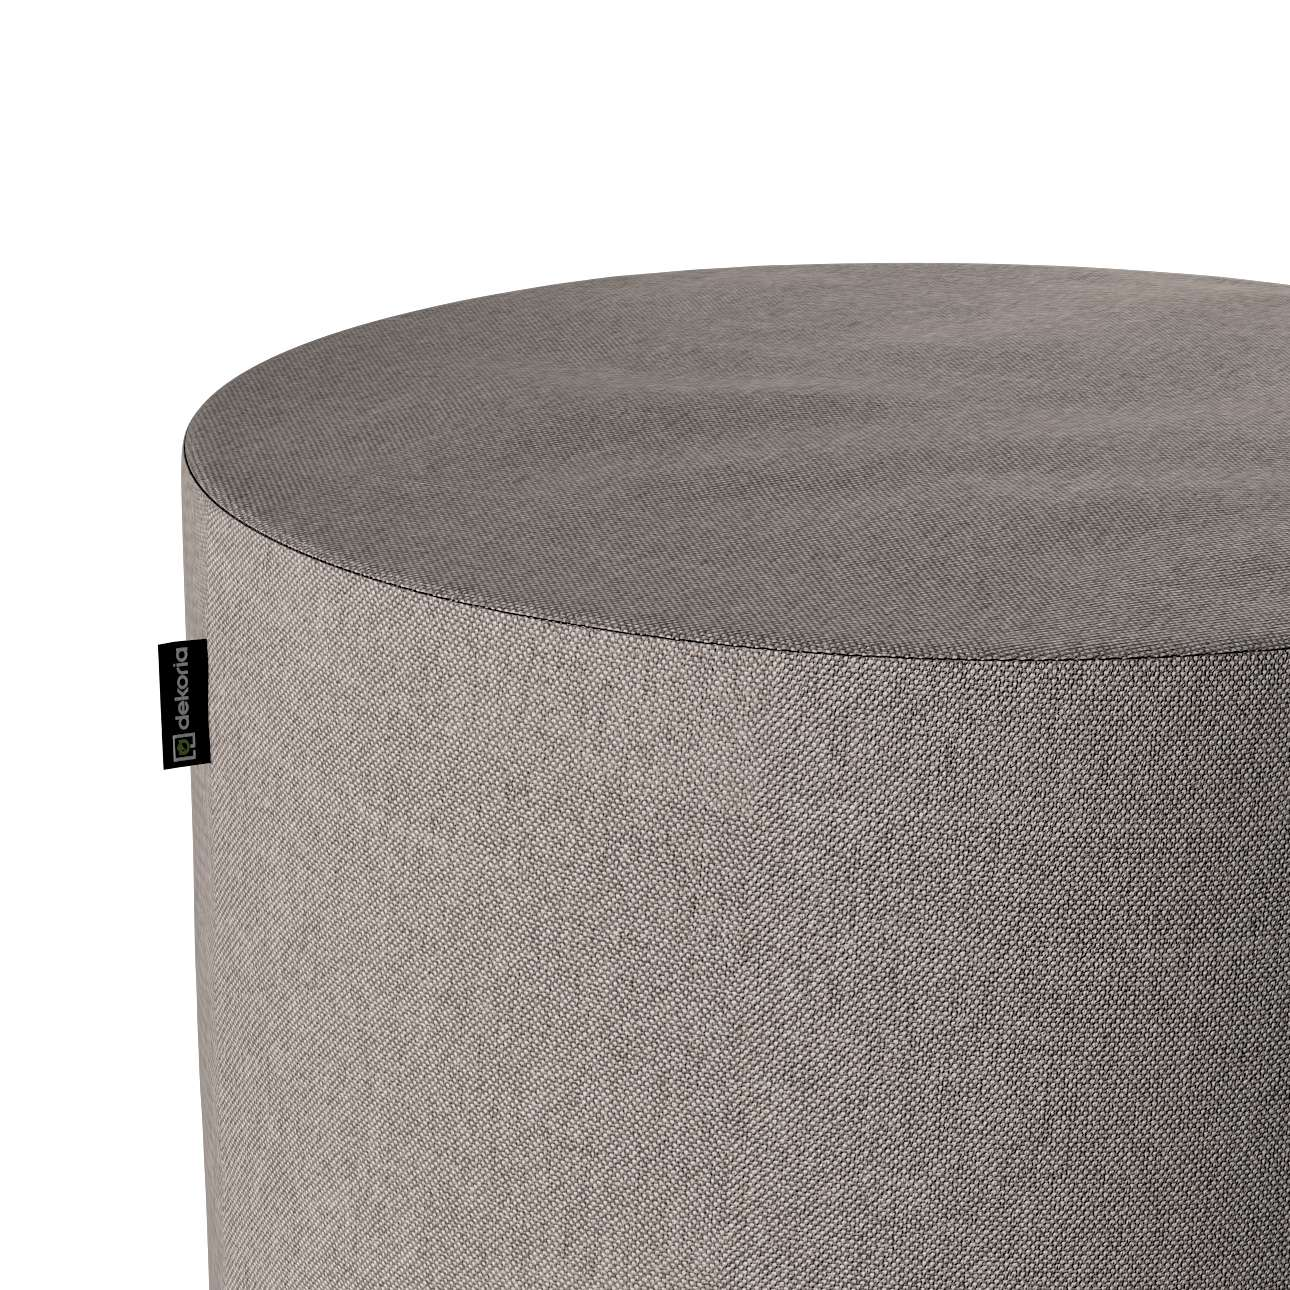 Pouf Barrel von der Kollektion Etna, Stoff: 705-09